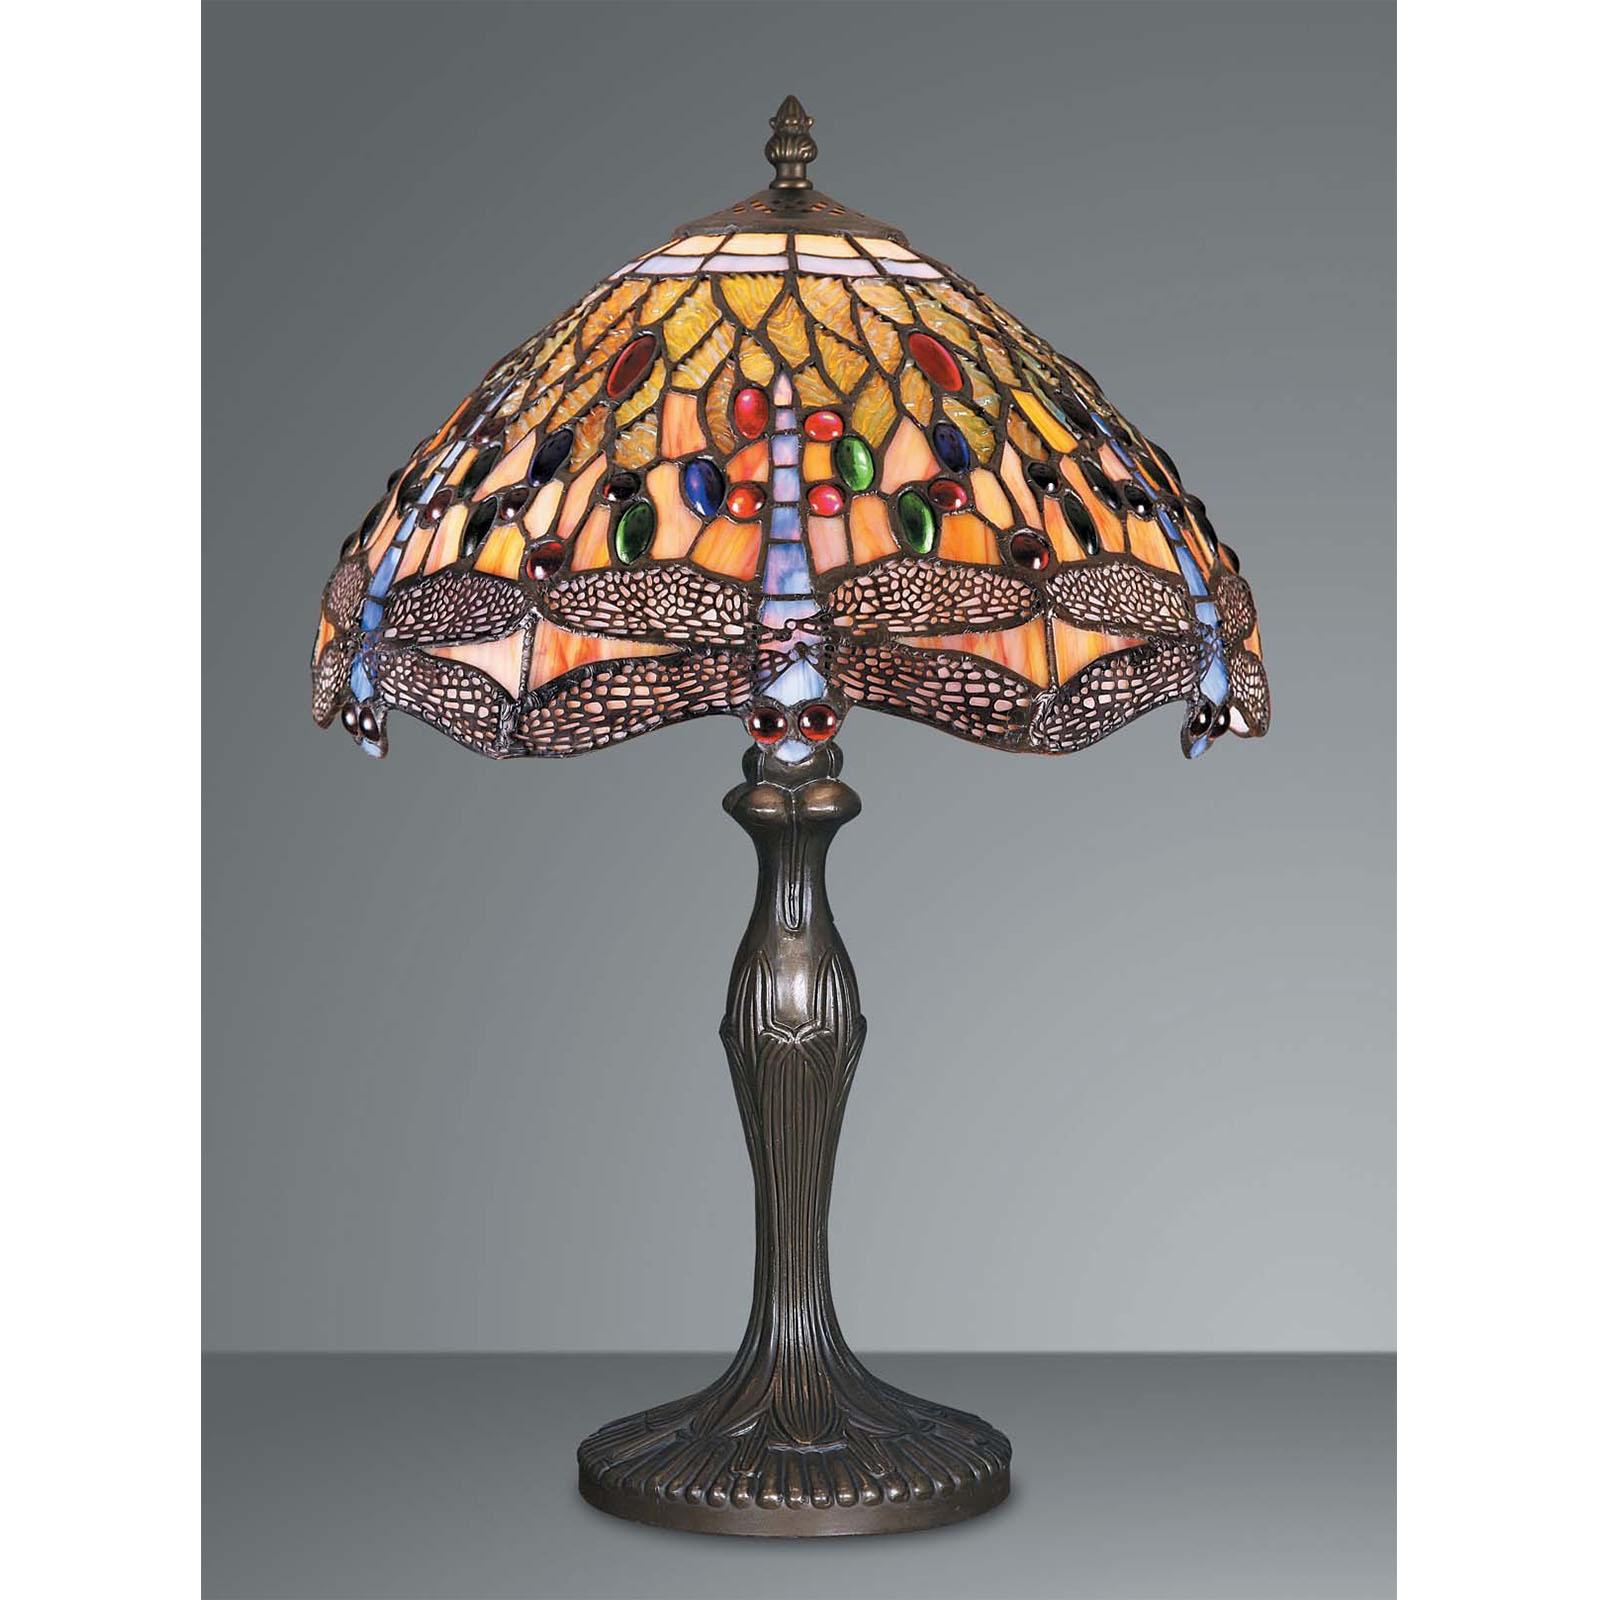 Tiffany Tischlampe Libellen Blau 47 5cm Bunte Lampe Glasperlen